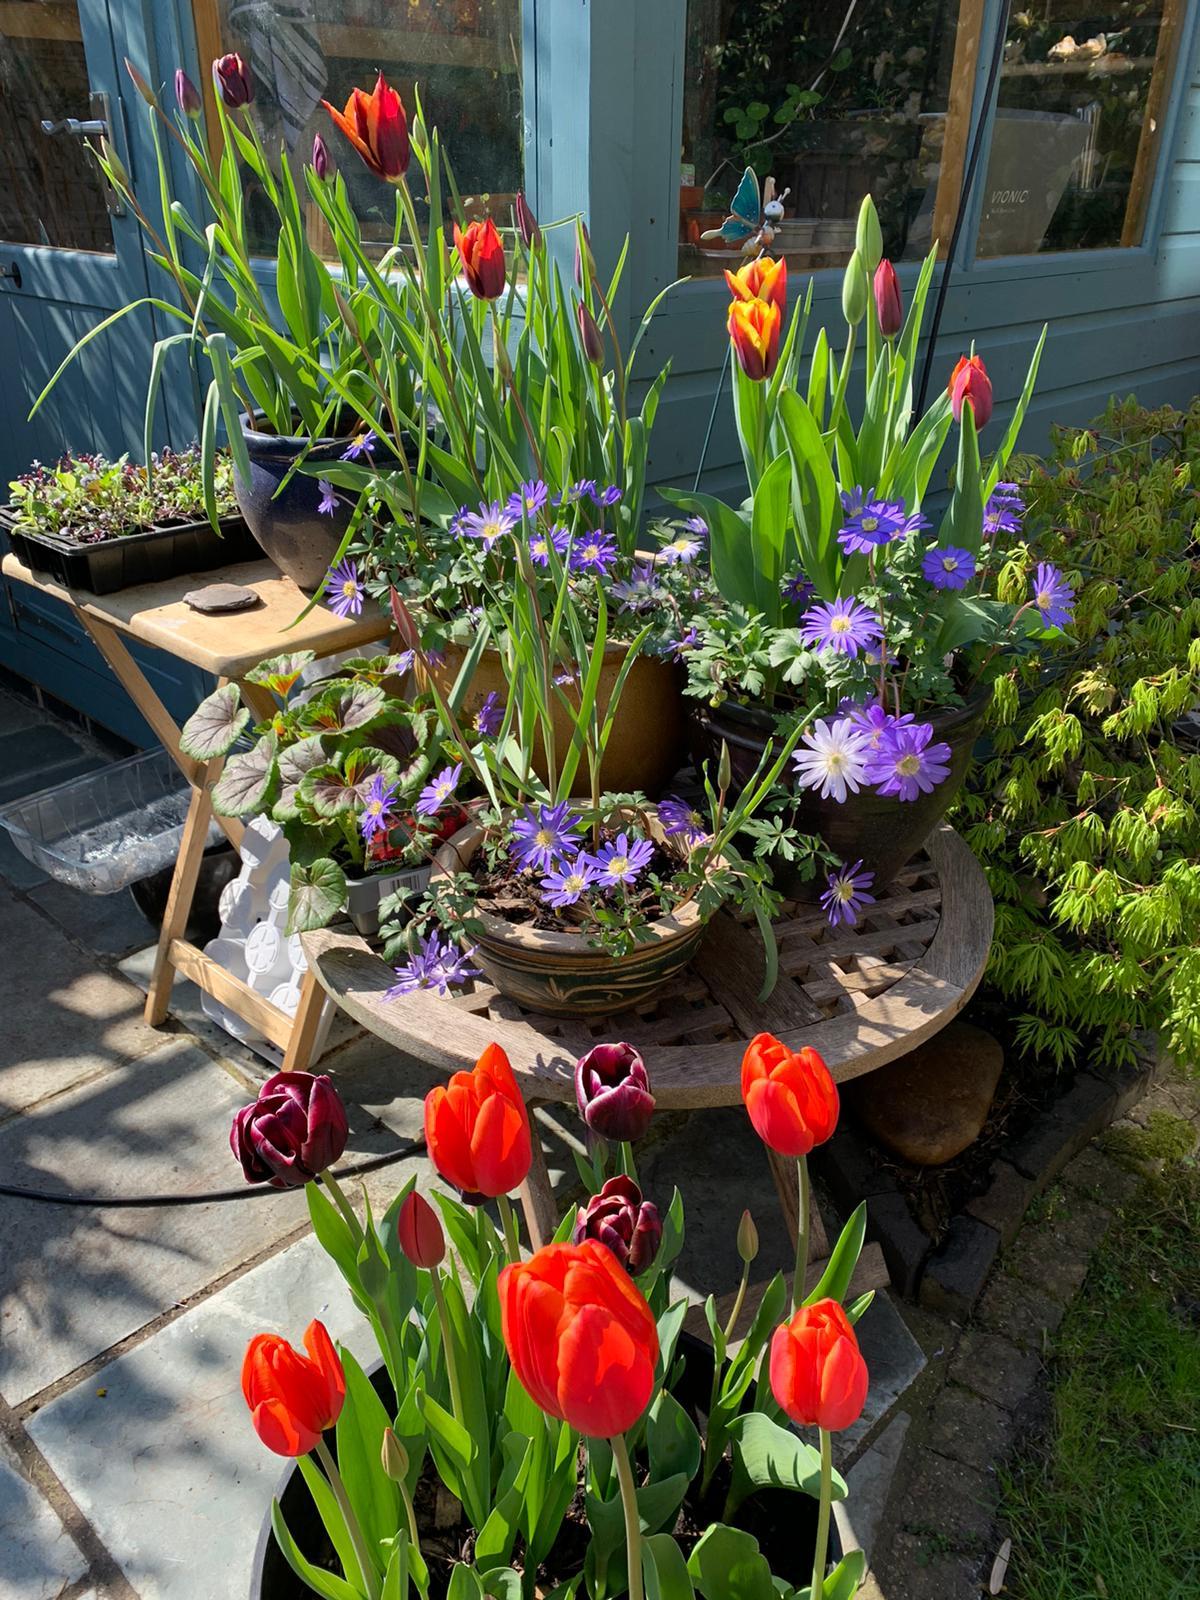 fran tulips